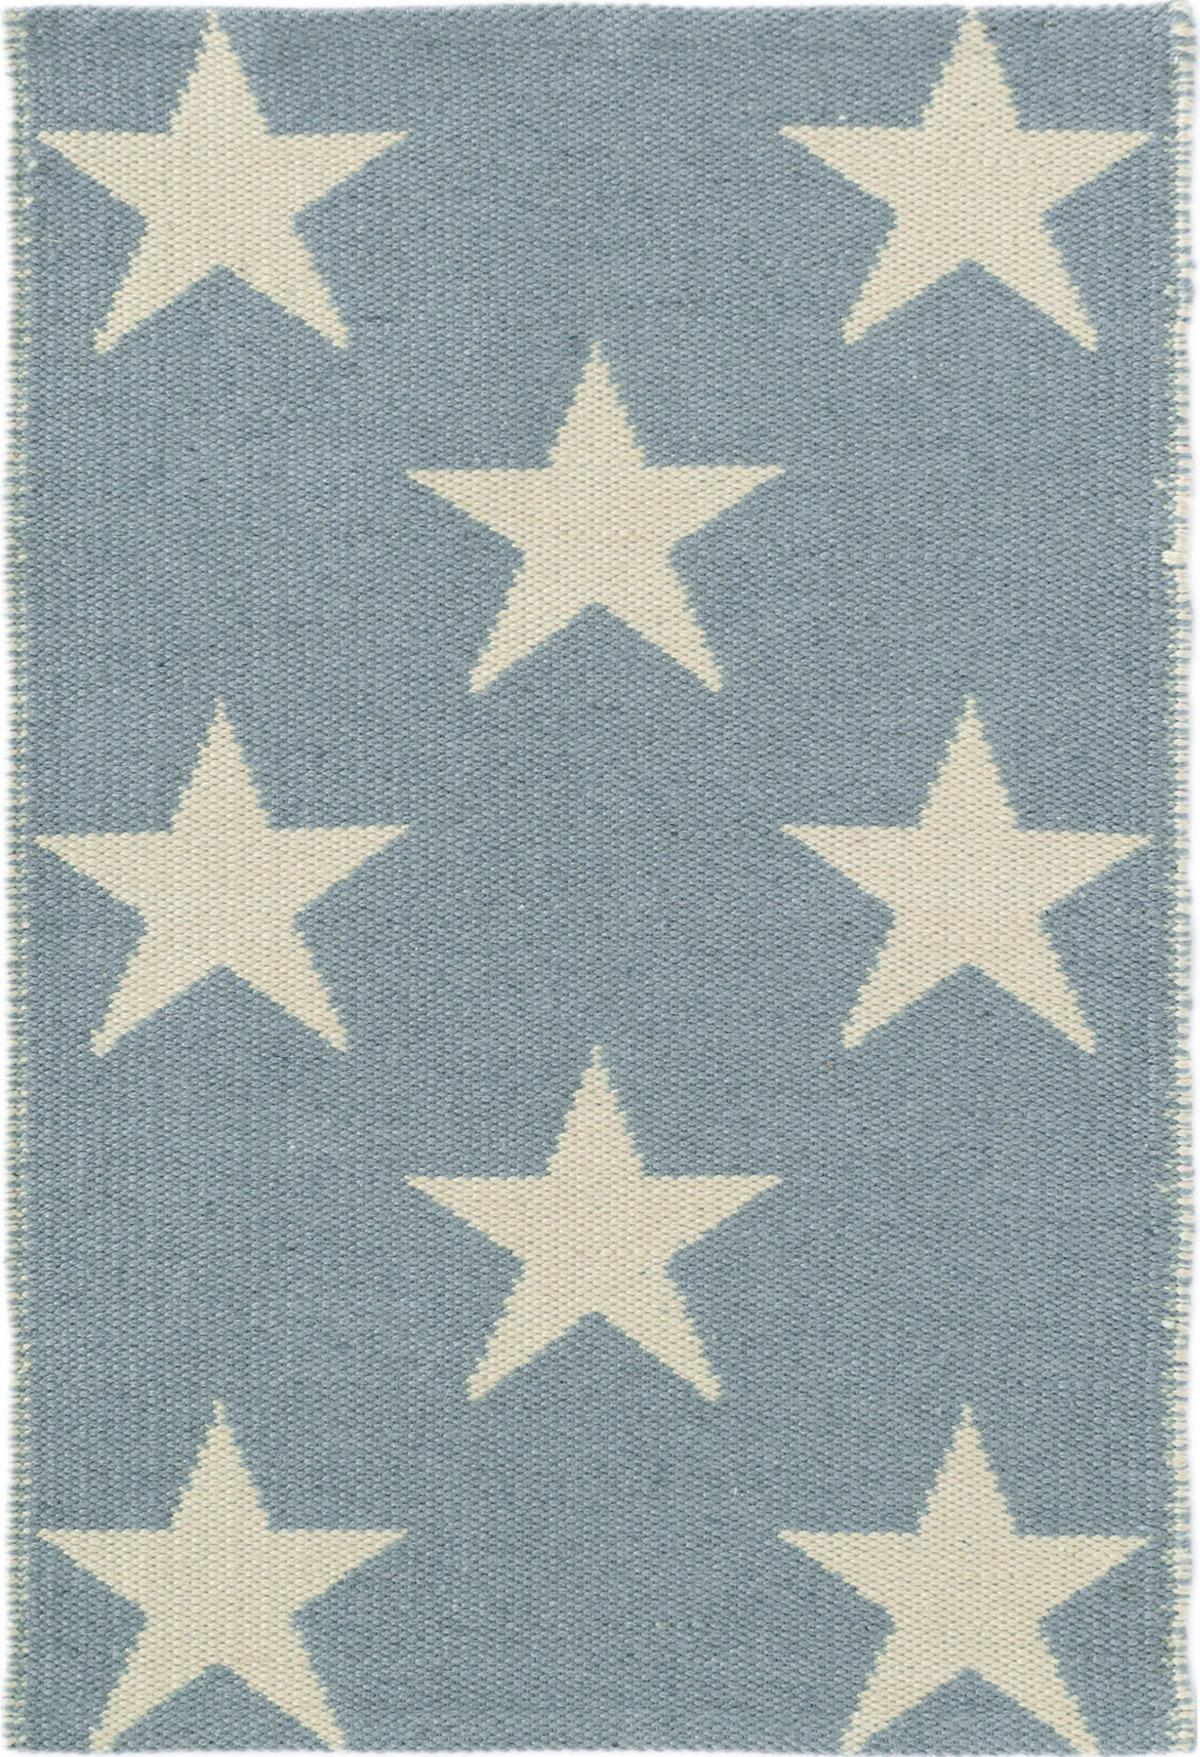 Star Swedish Blue/Ivory Indoor/Outdoor Rug